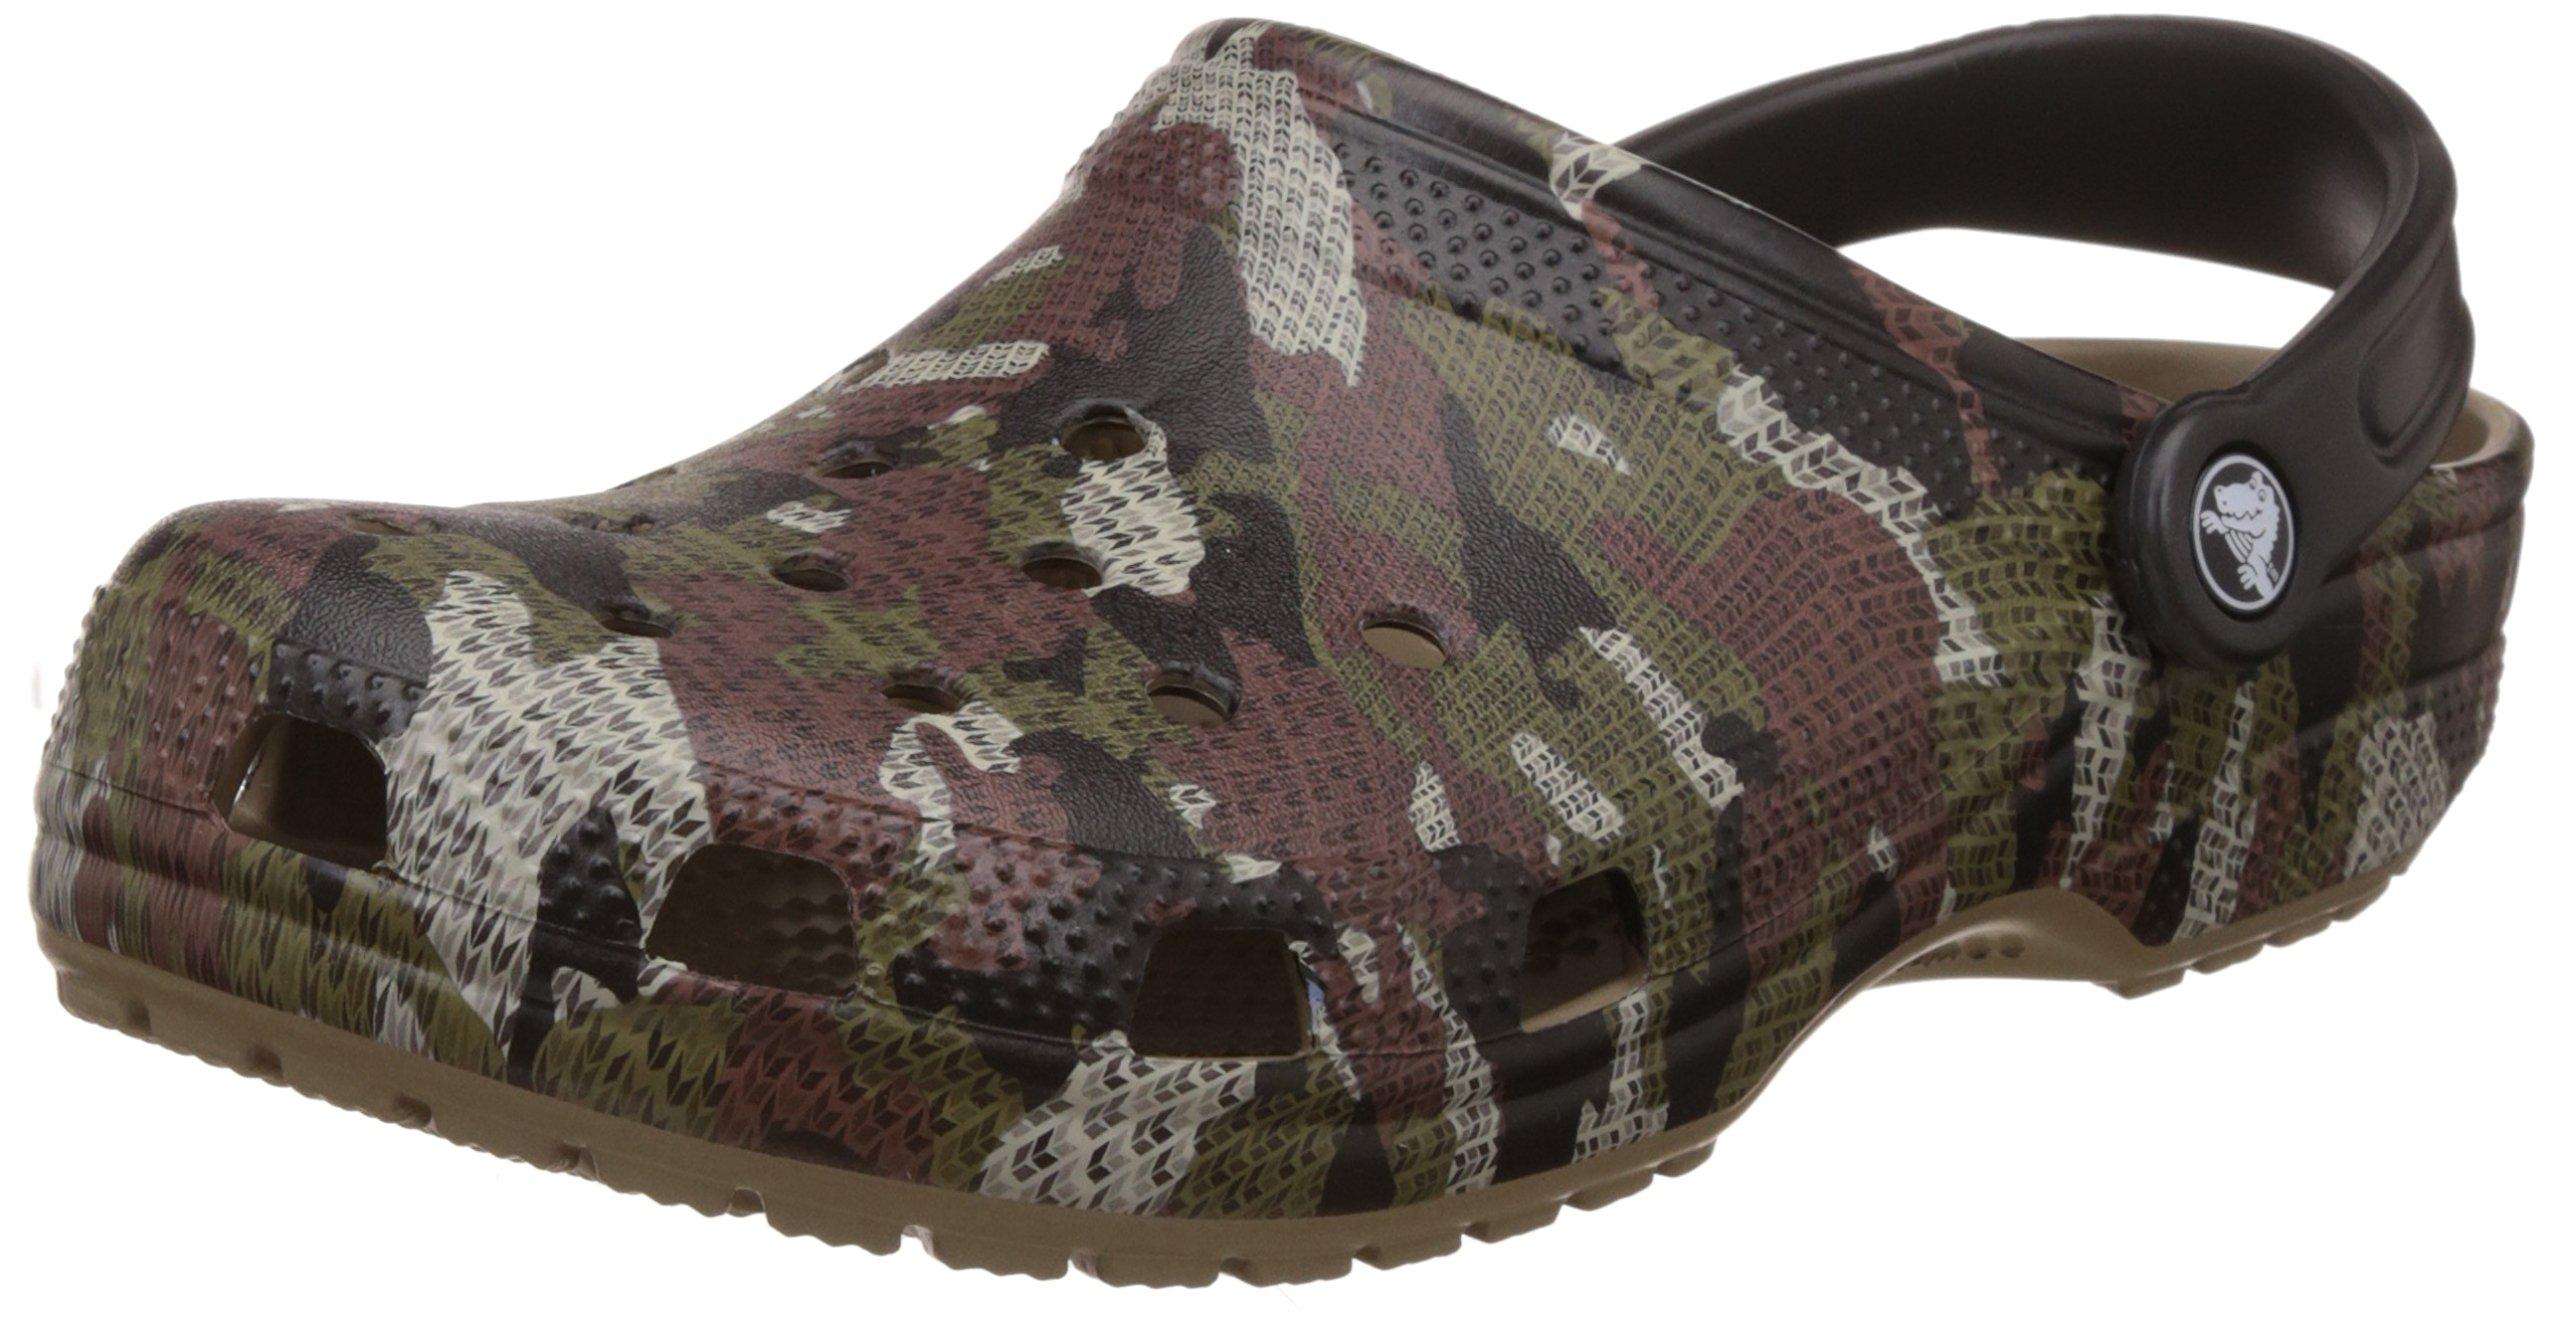 crocs Unisex Classic Printed Clog Mule, Blue Jean, Khaki, 8 US Men / 10 US Women